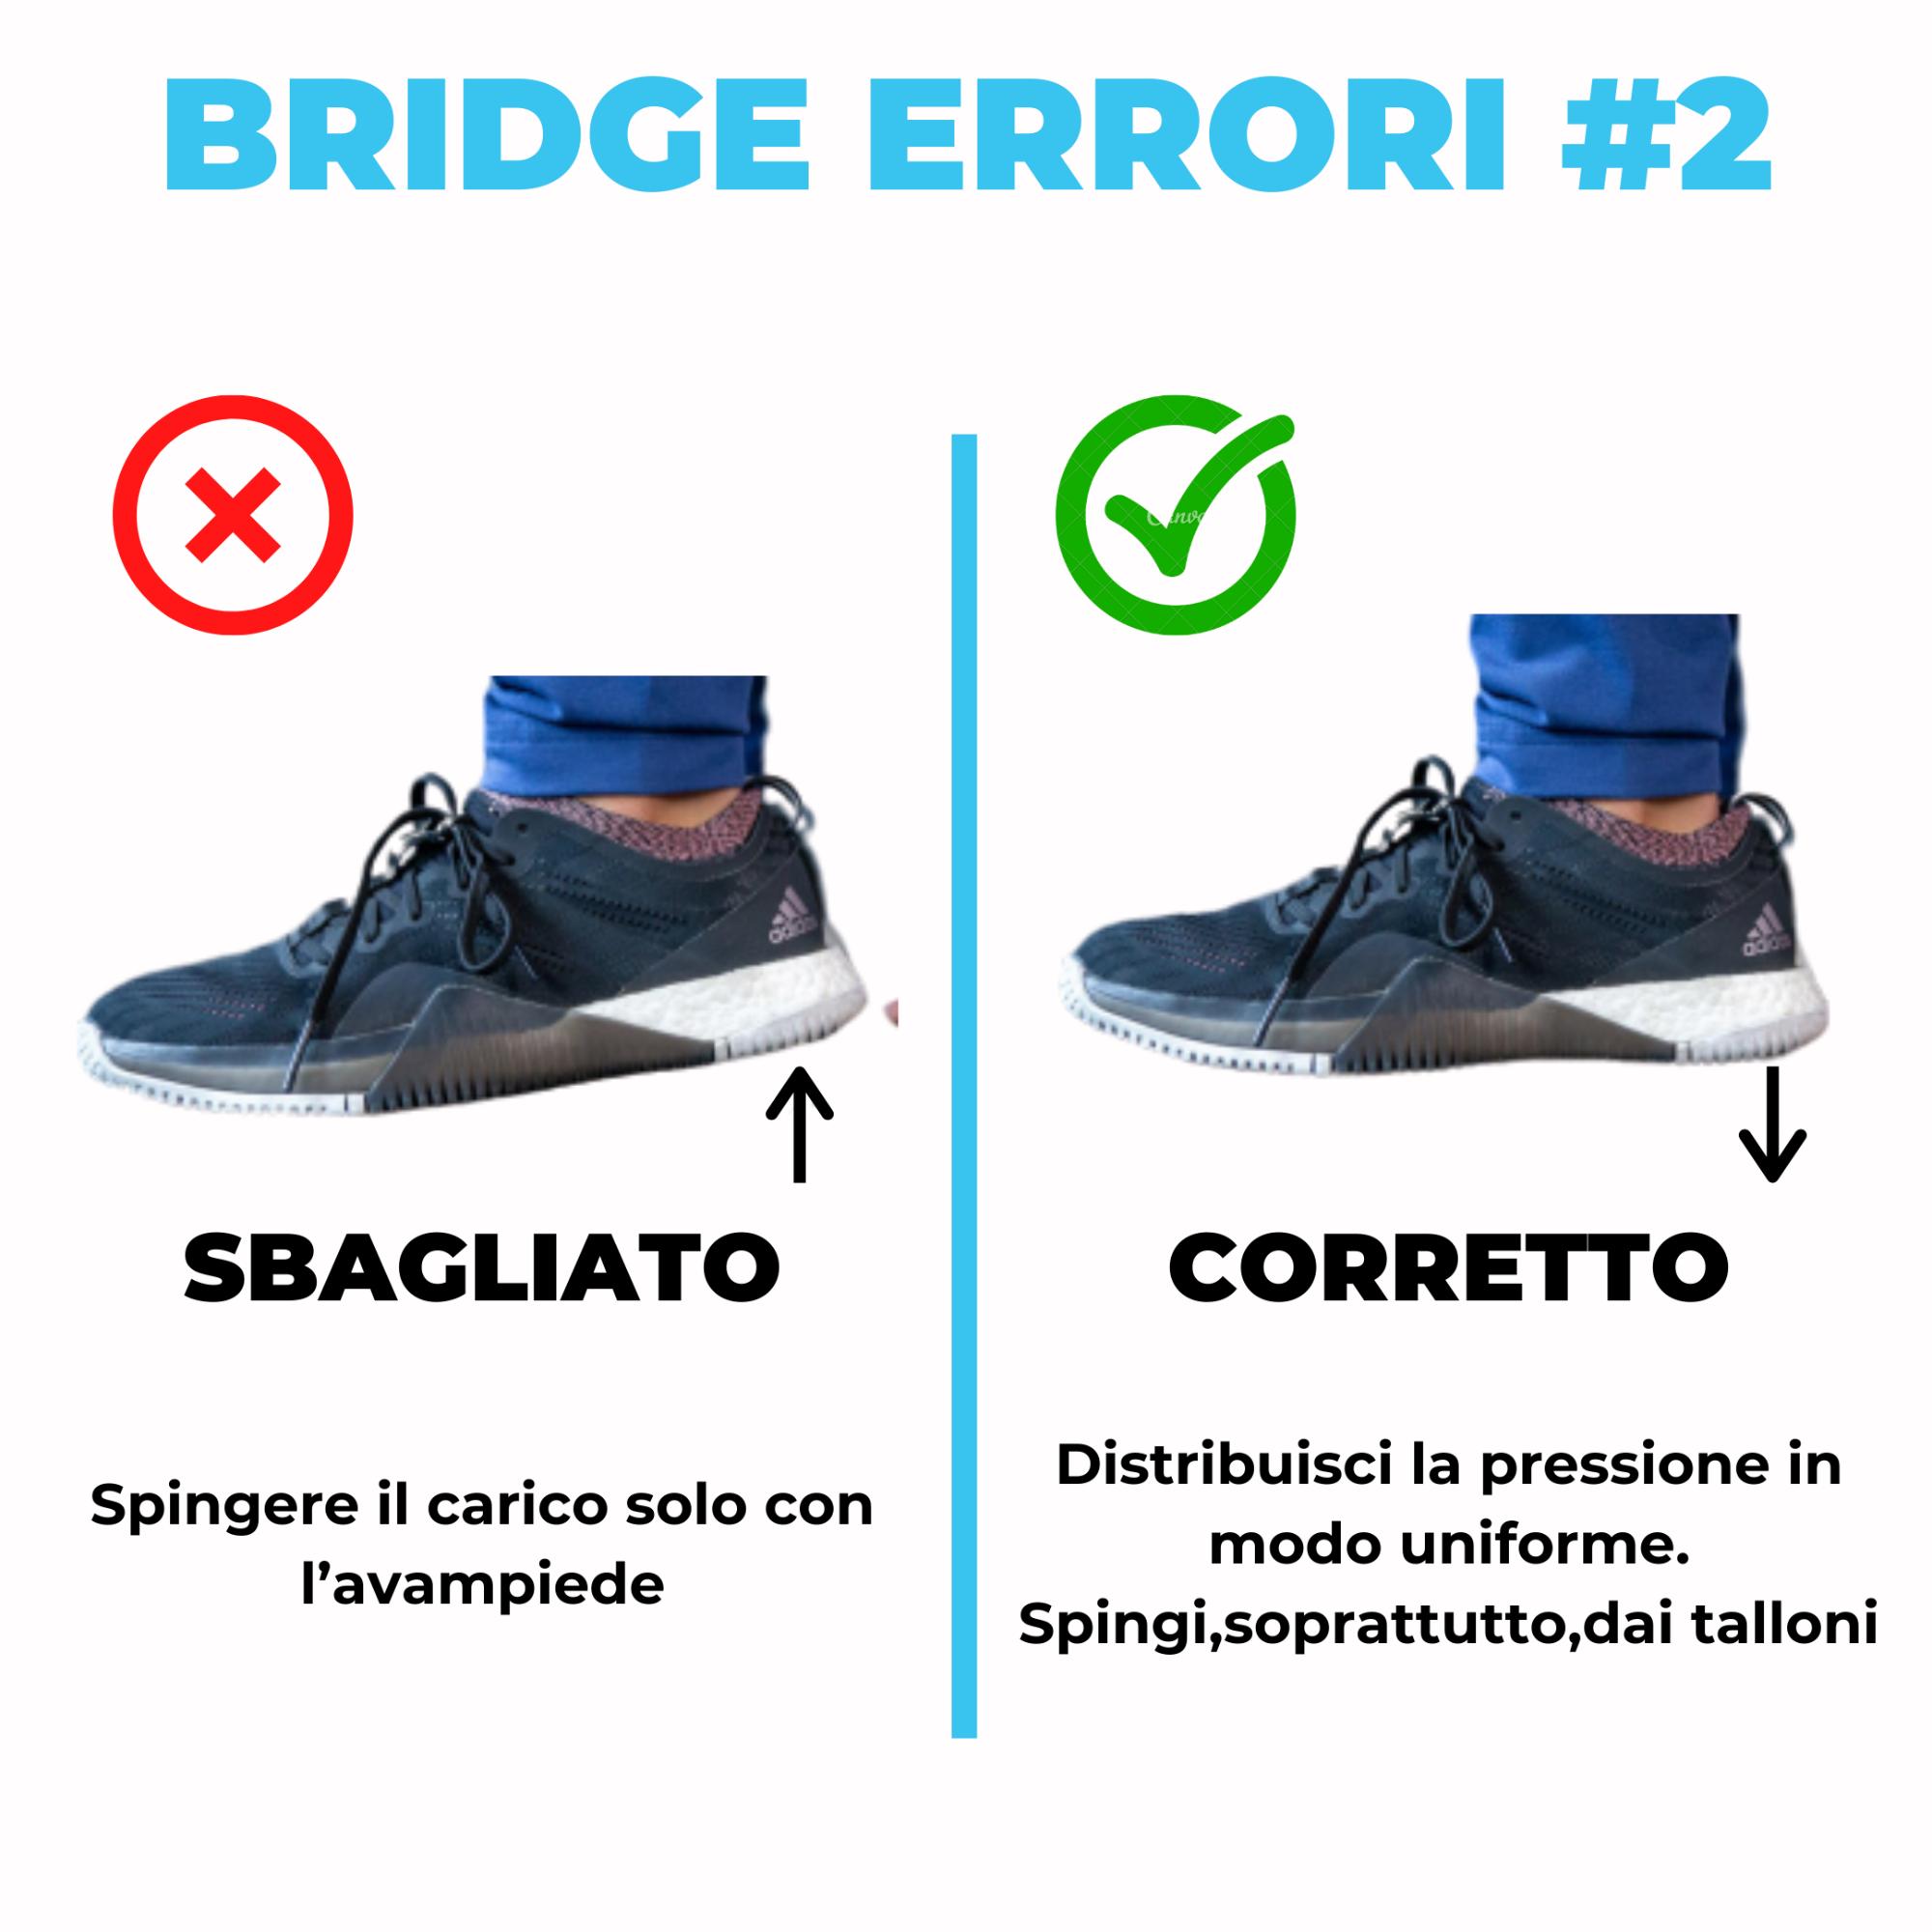 bridgeerrori2-1608289080.png